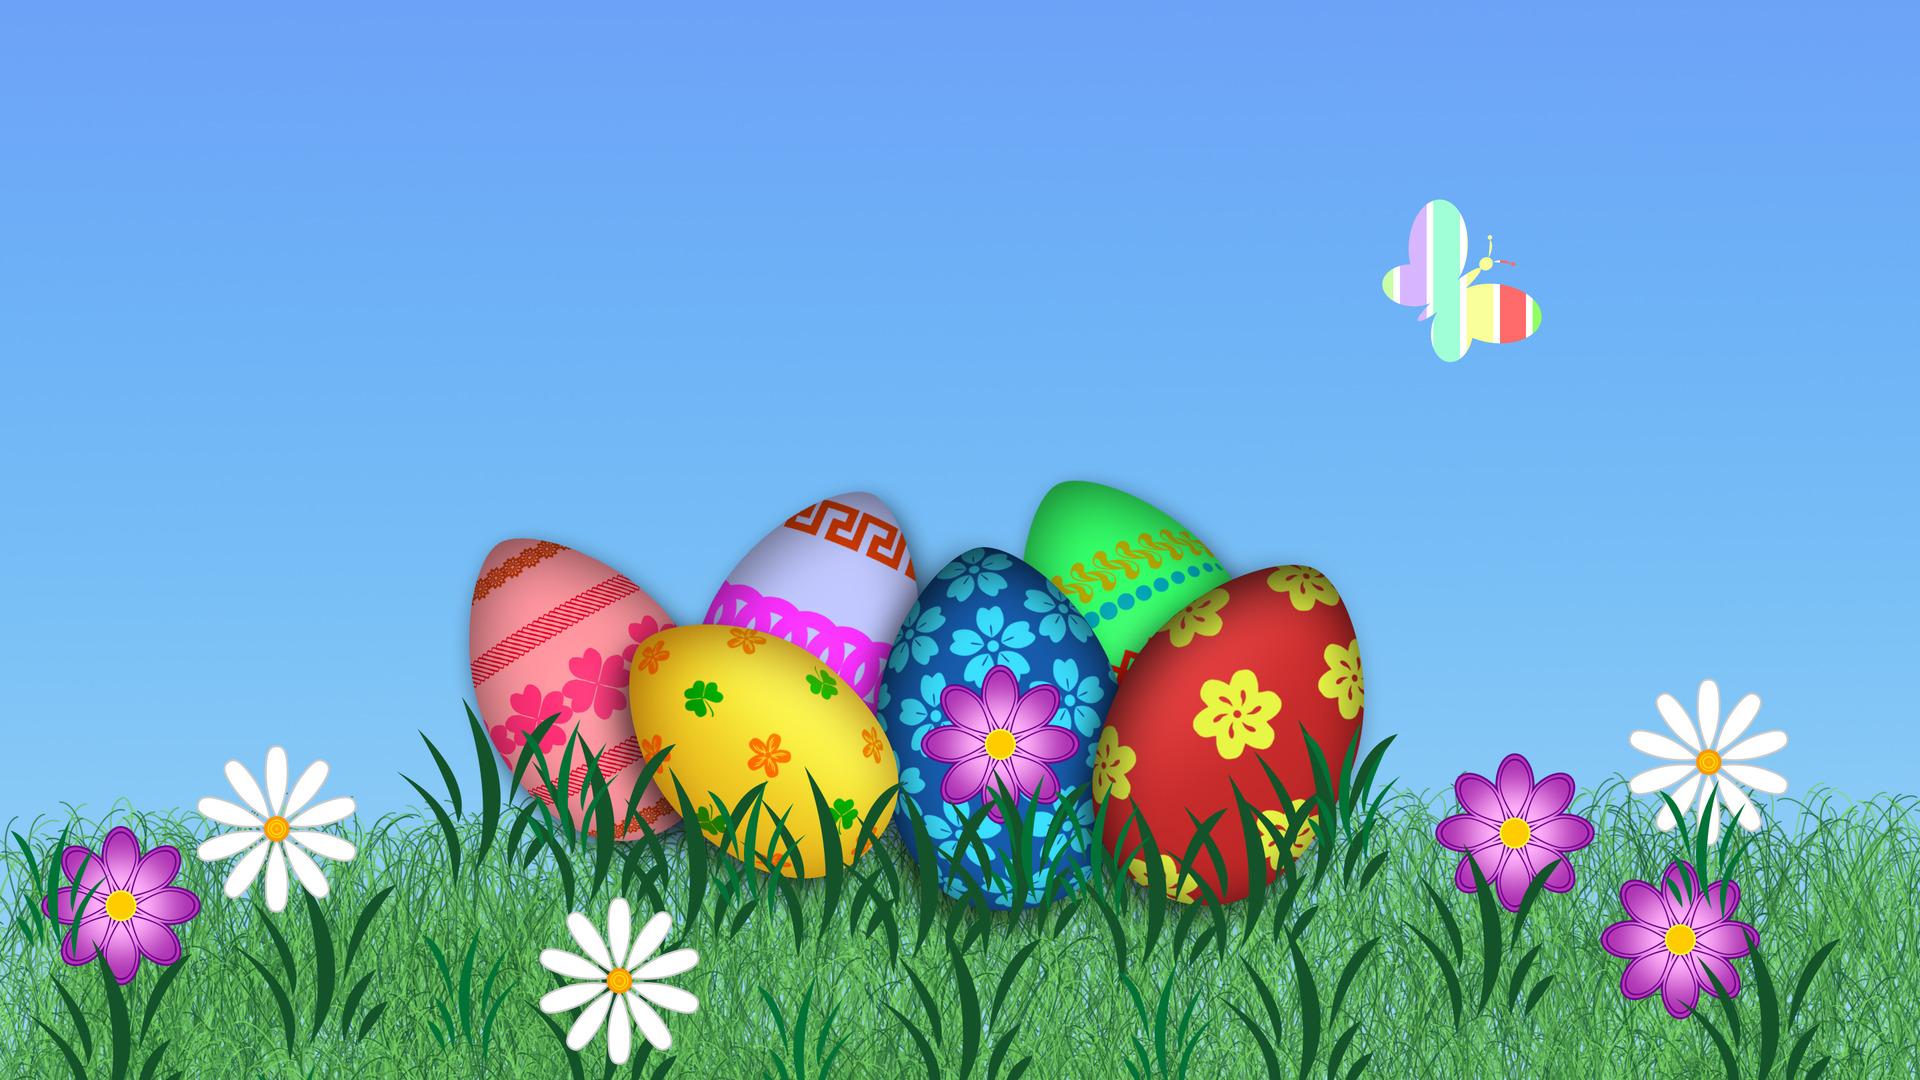 Download Happy Easter wallpaper 1920x1080